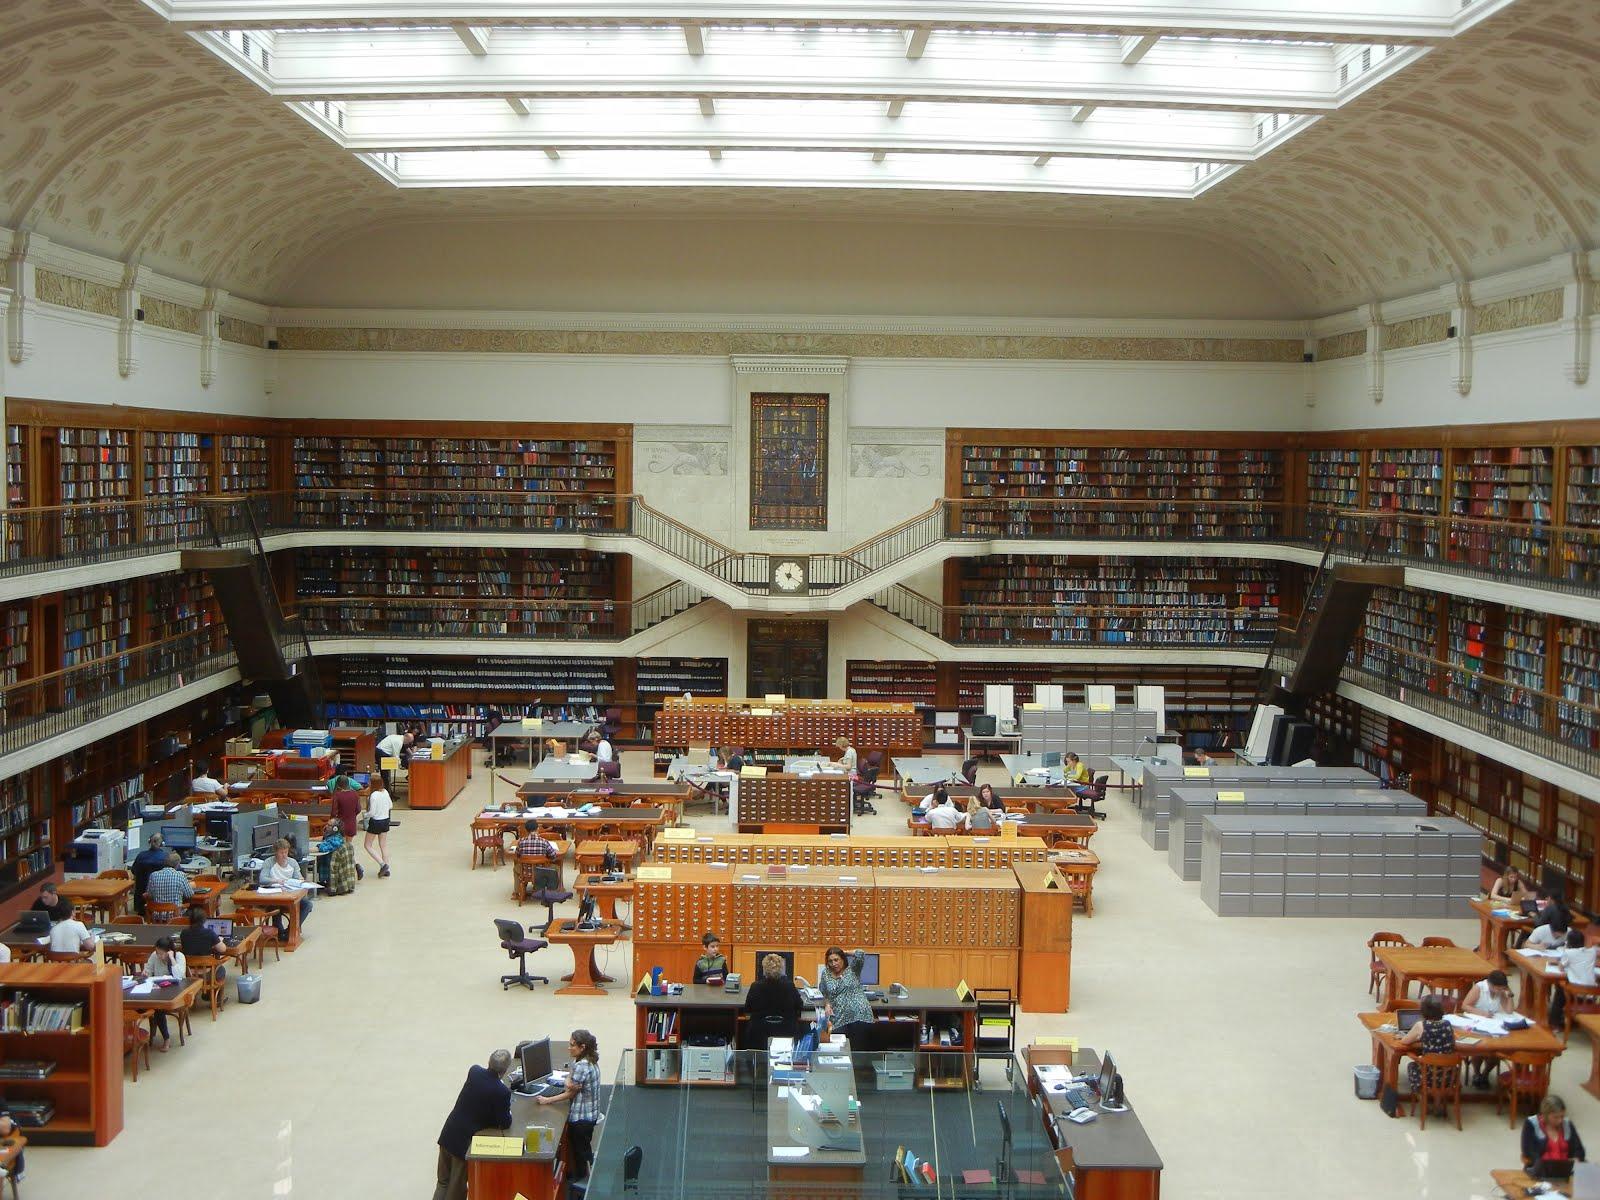 Sydney Australia Mitchell Library Reading Room